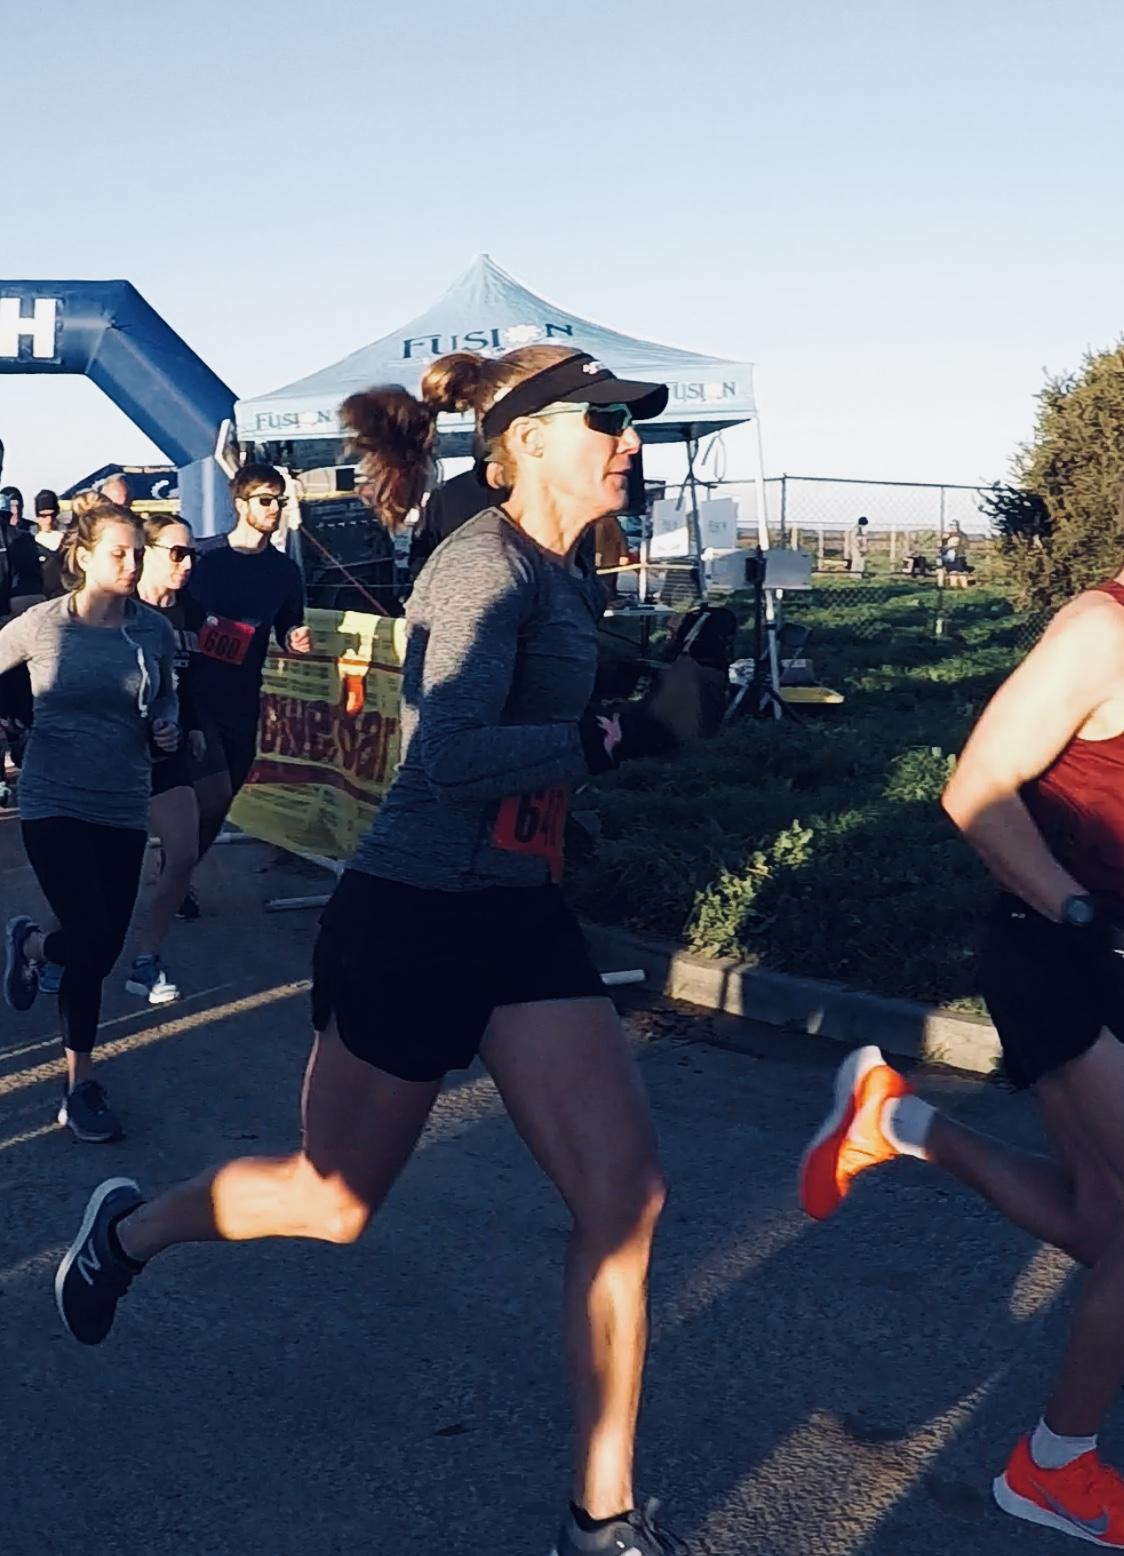 The start of the Seaside half marathon, February, 2019.